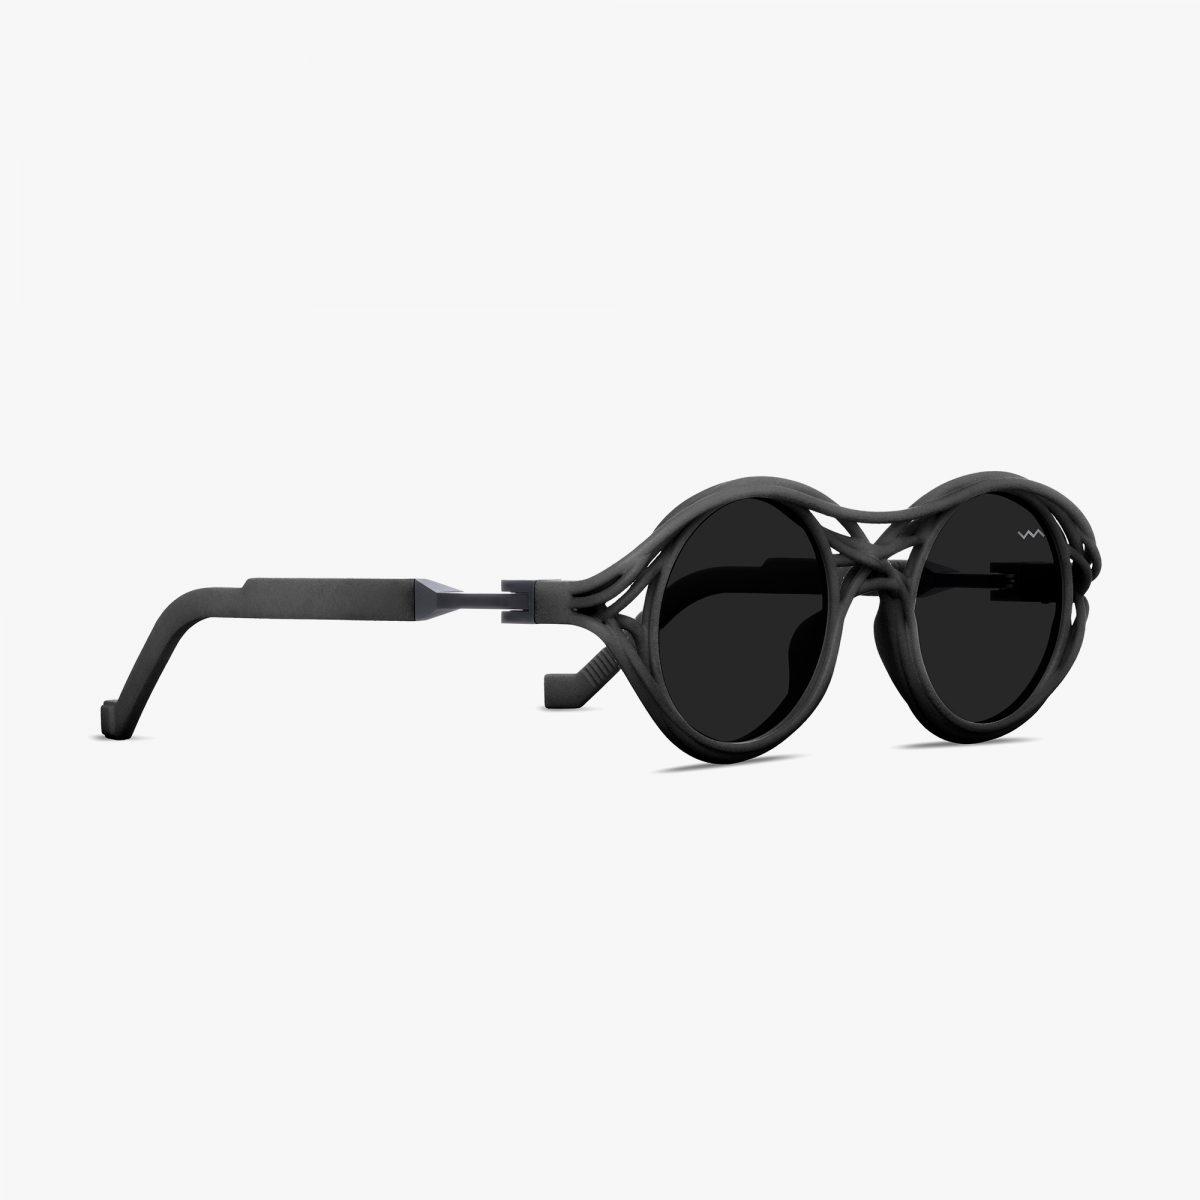 vava eyewear sunglass online shop cl0015 black